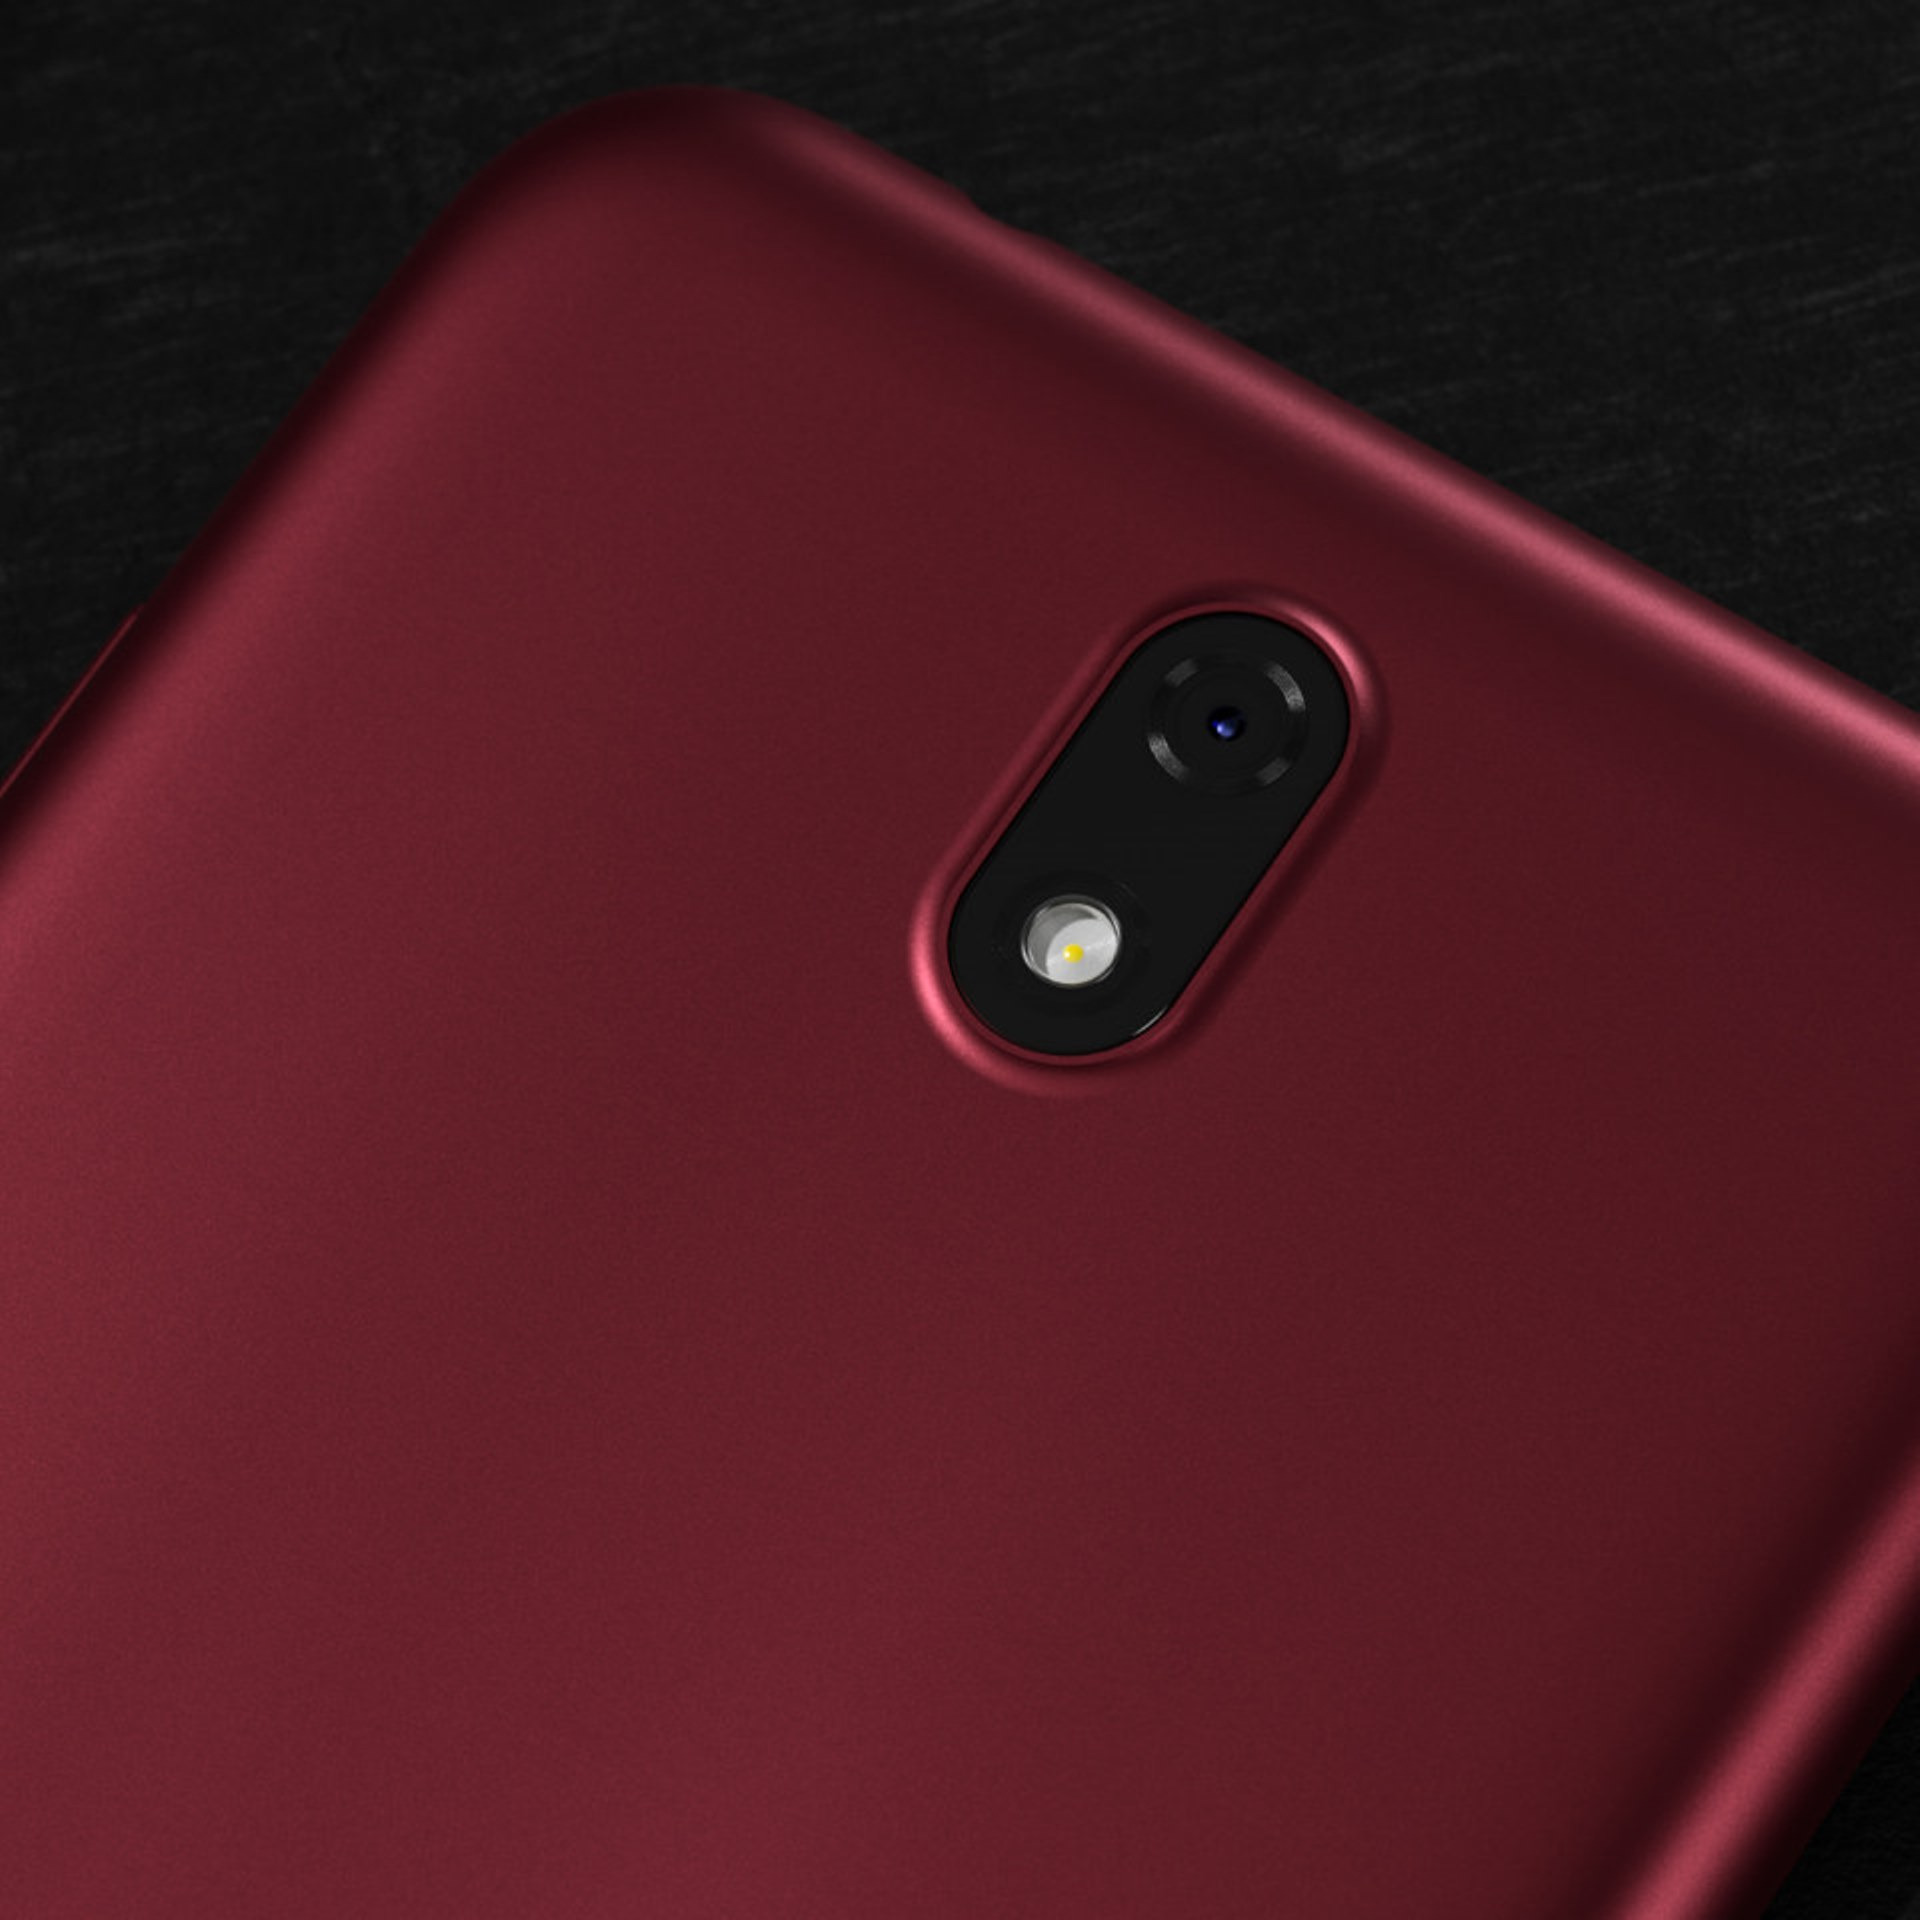 Nokia brzy přinese model C1 Plus